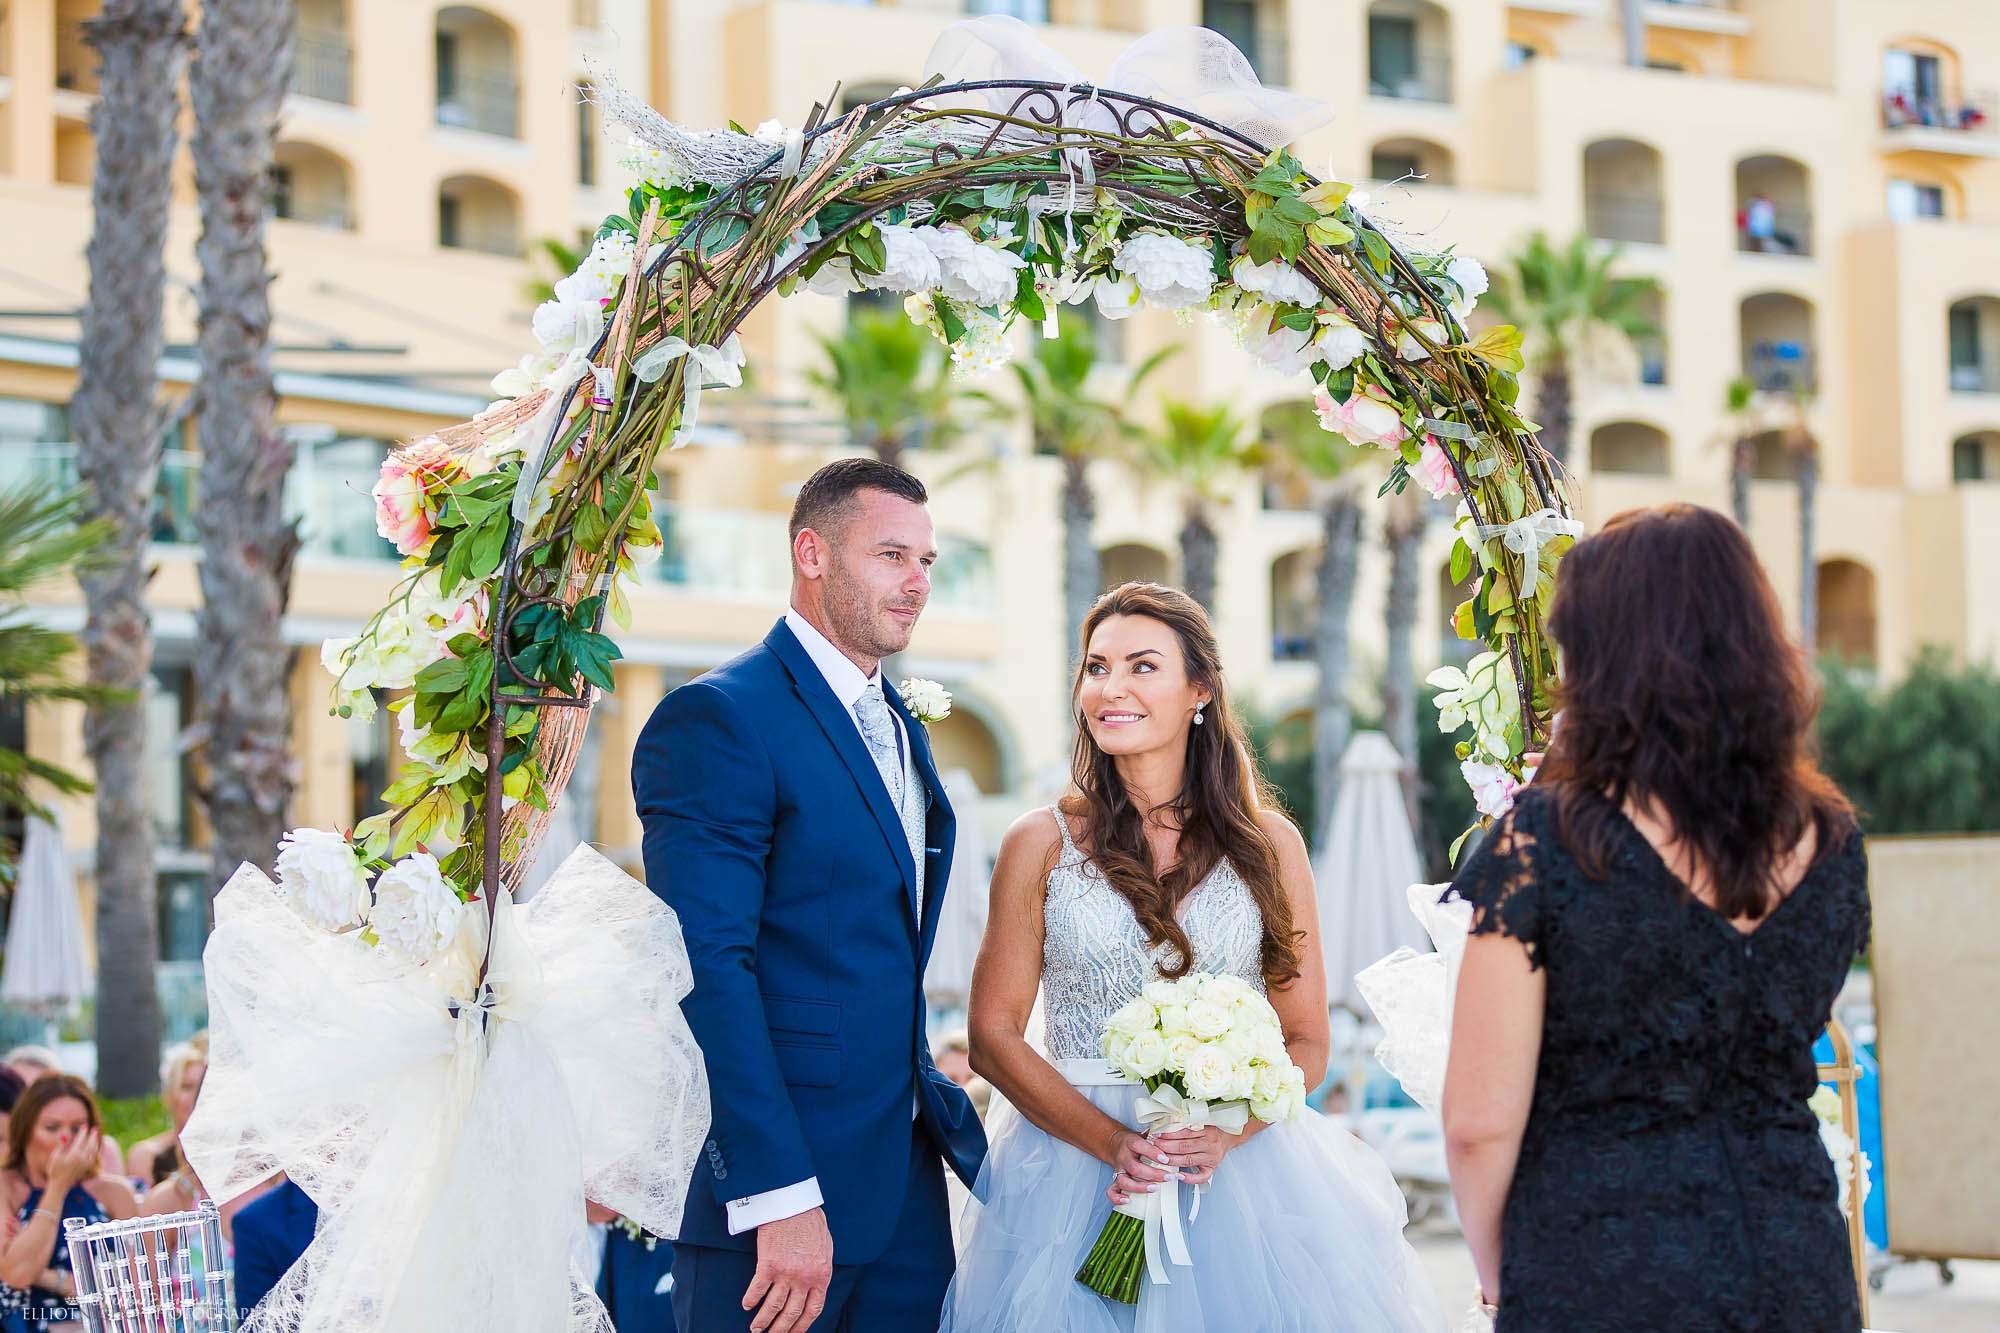 Bride and groom during their destination wedding ceremony. Elliot Nichol Photography.